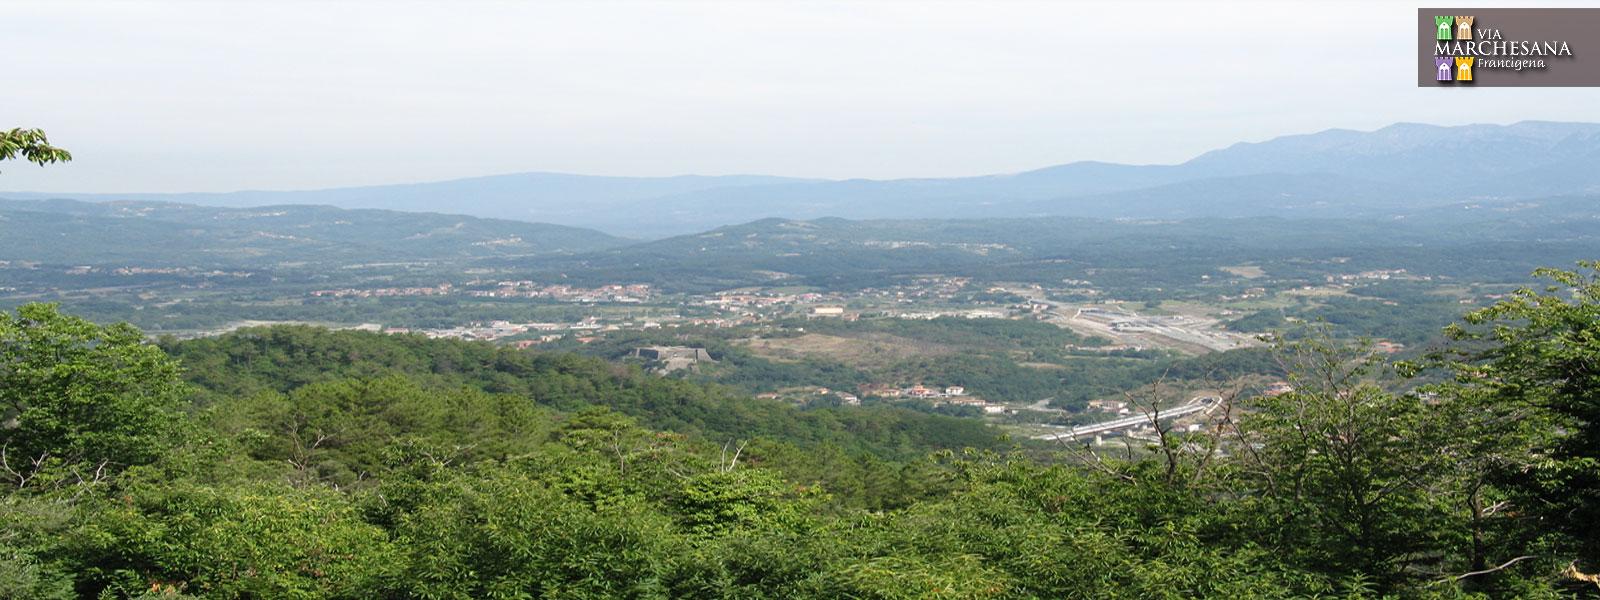 panorama-toscano-001